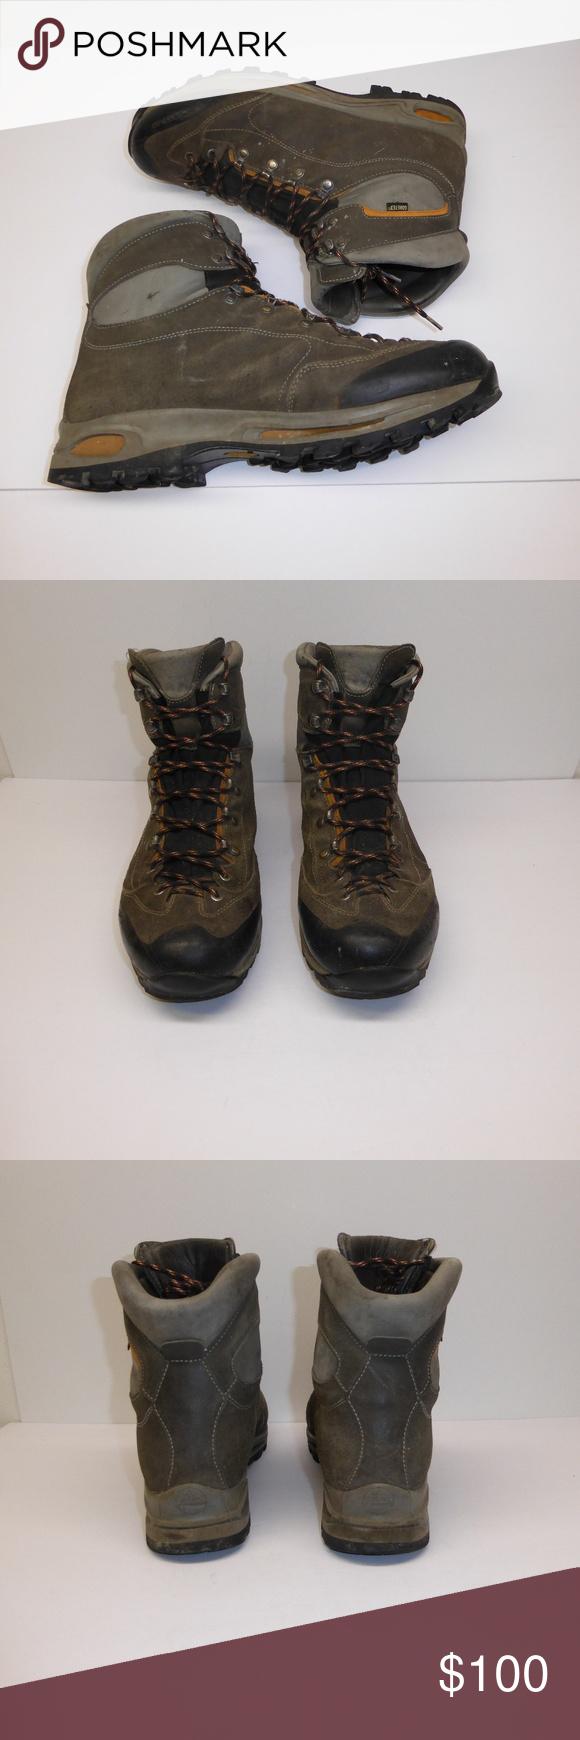 7c6ff4b18a3 La Sportiva Omega GTX Hiking Boots SIze 47 #076 La Sportiva Omega ...